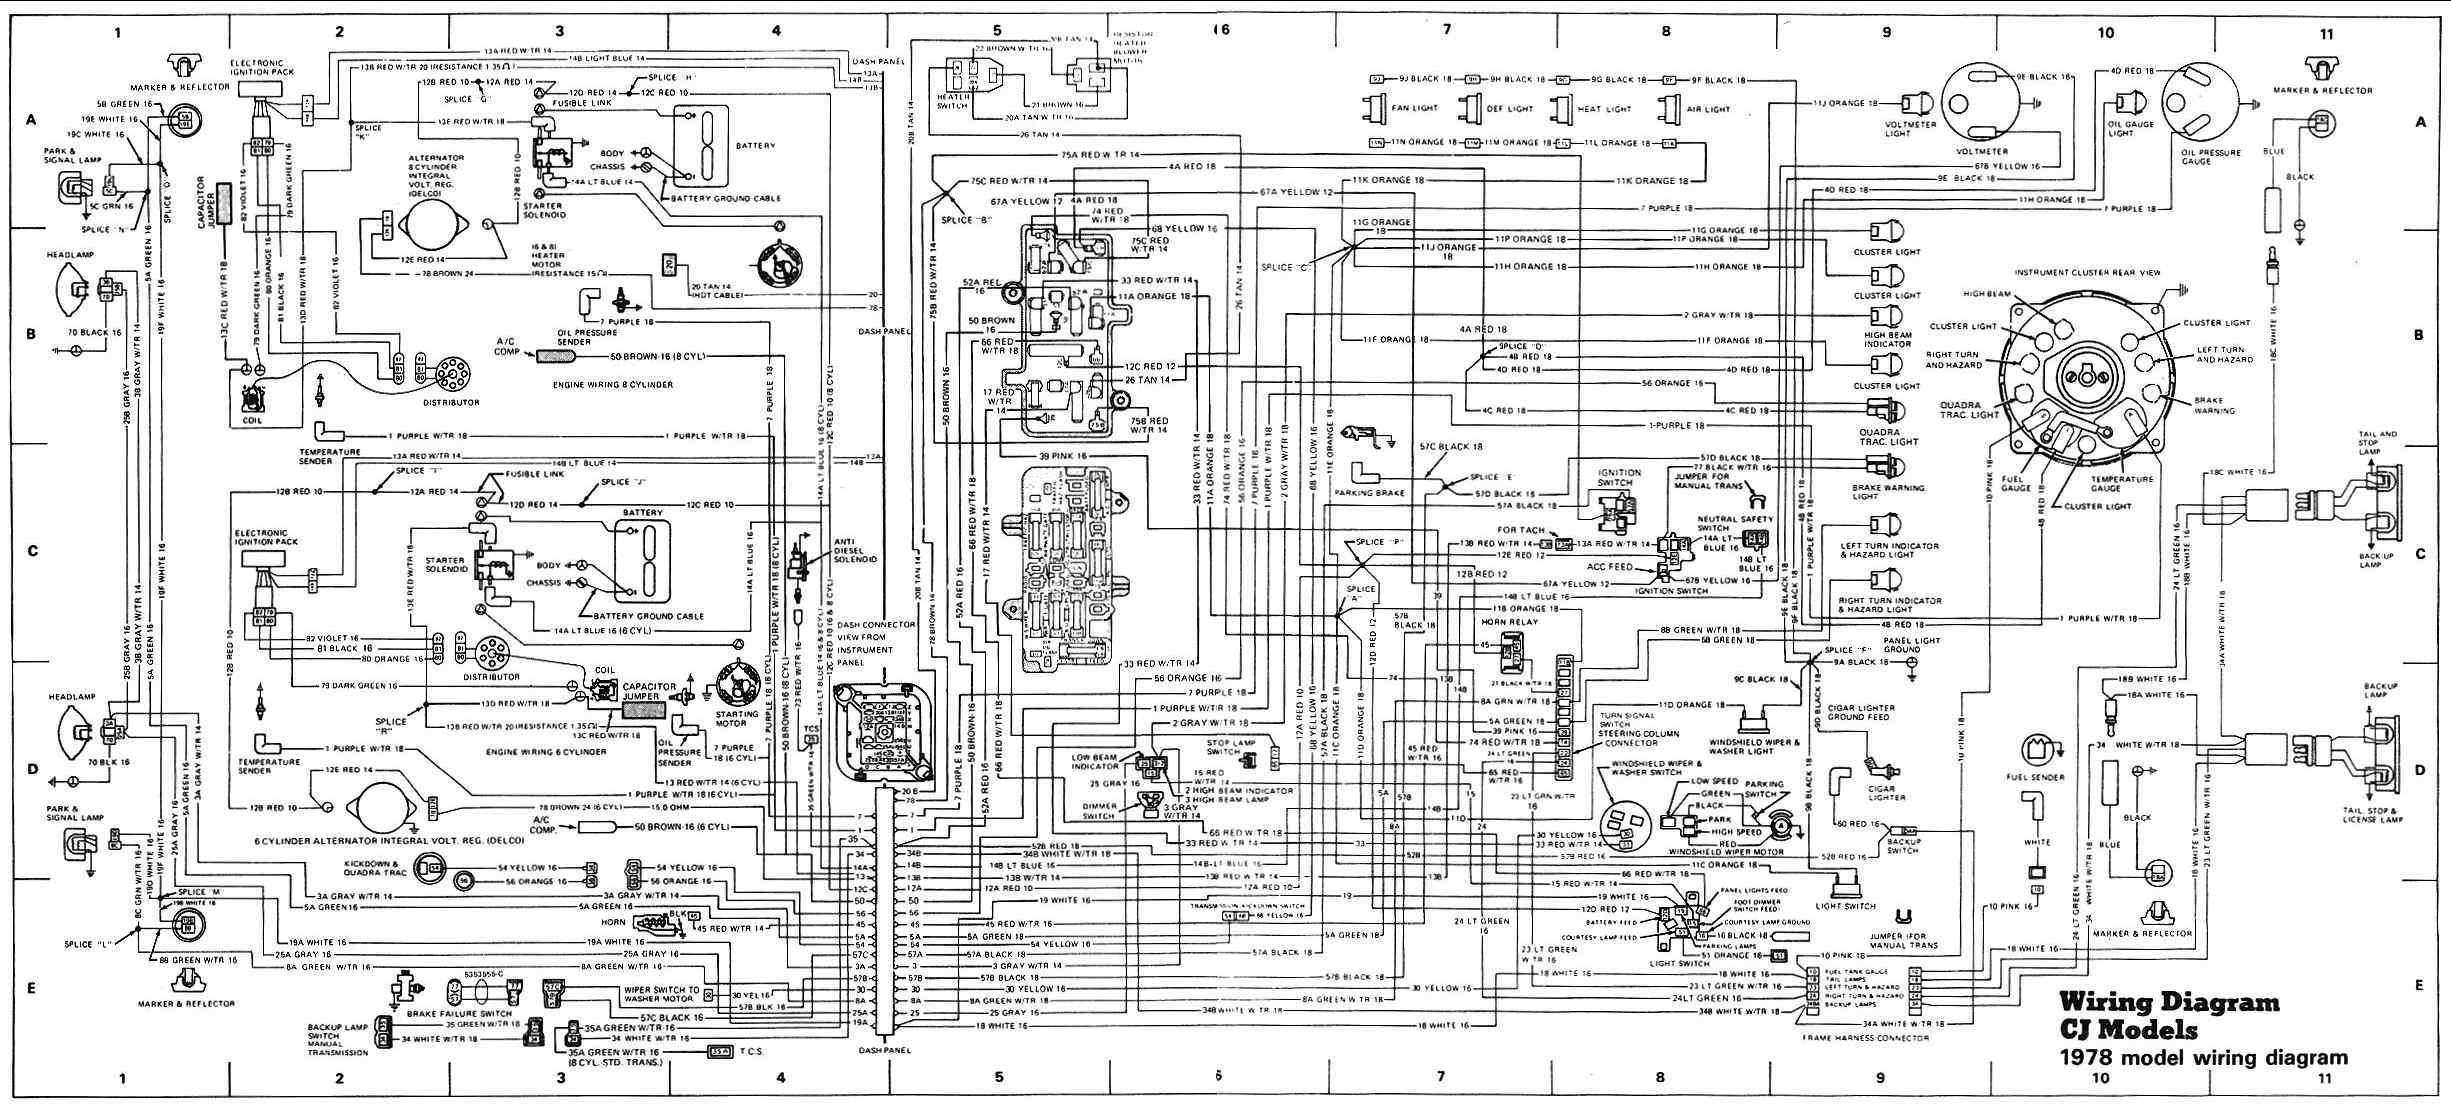 jeep cj7 wiring schematic 1978 cj wiring diagram e2 wiring diagram 1979 jeep cj7 wiring diagram 1978 cj wiring diagram e2 wiring diagram